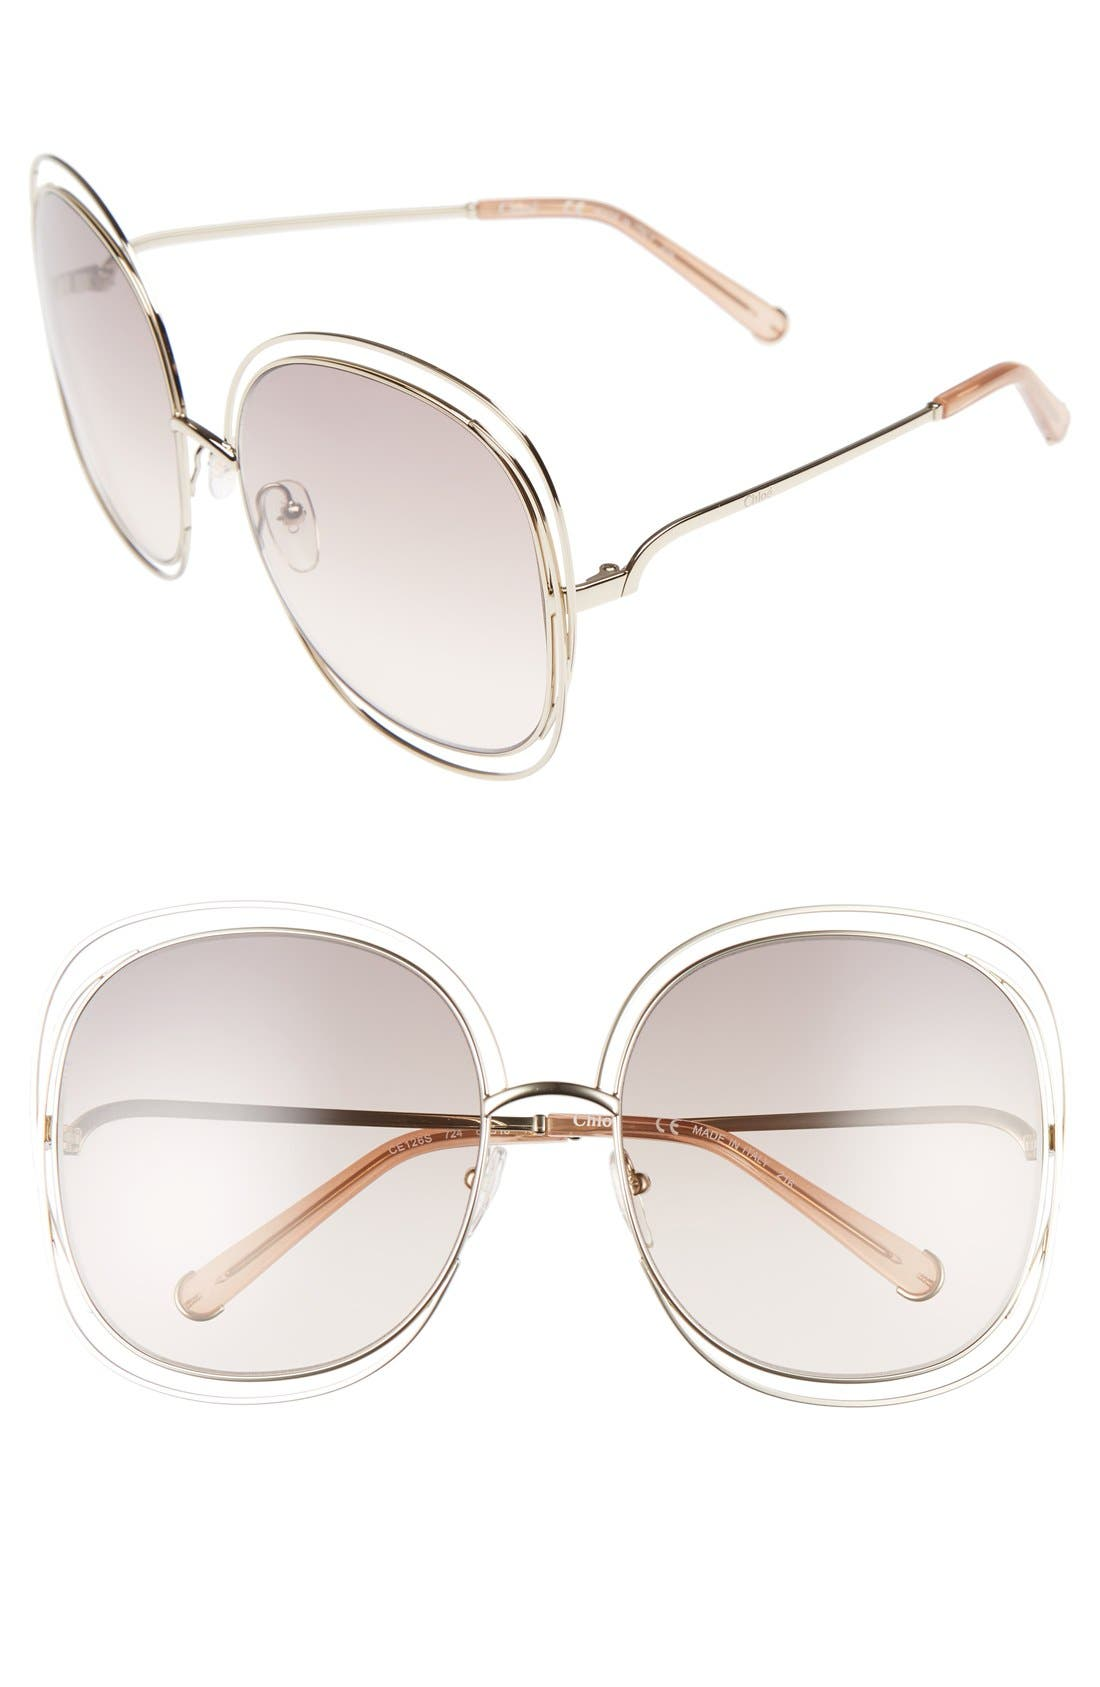 Chloé Carlina 62mm Oversize Sunglasses